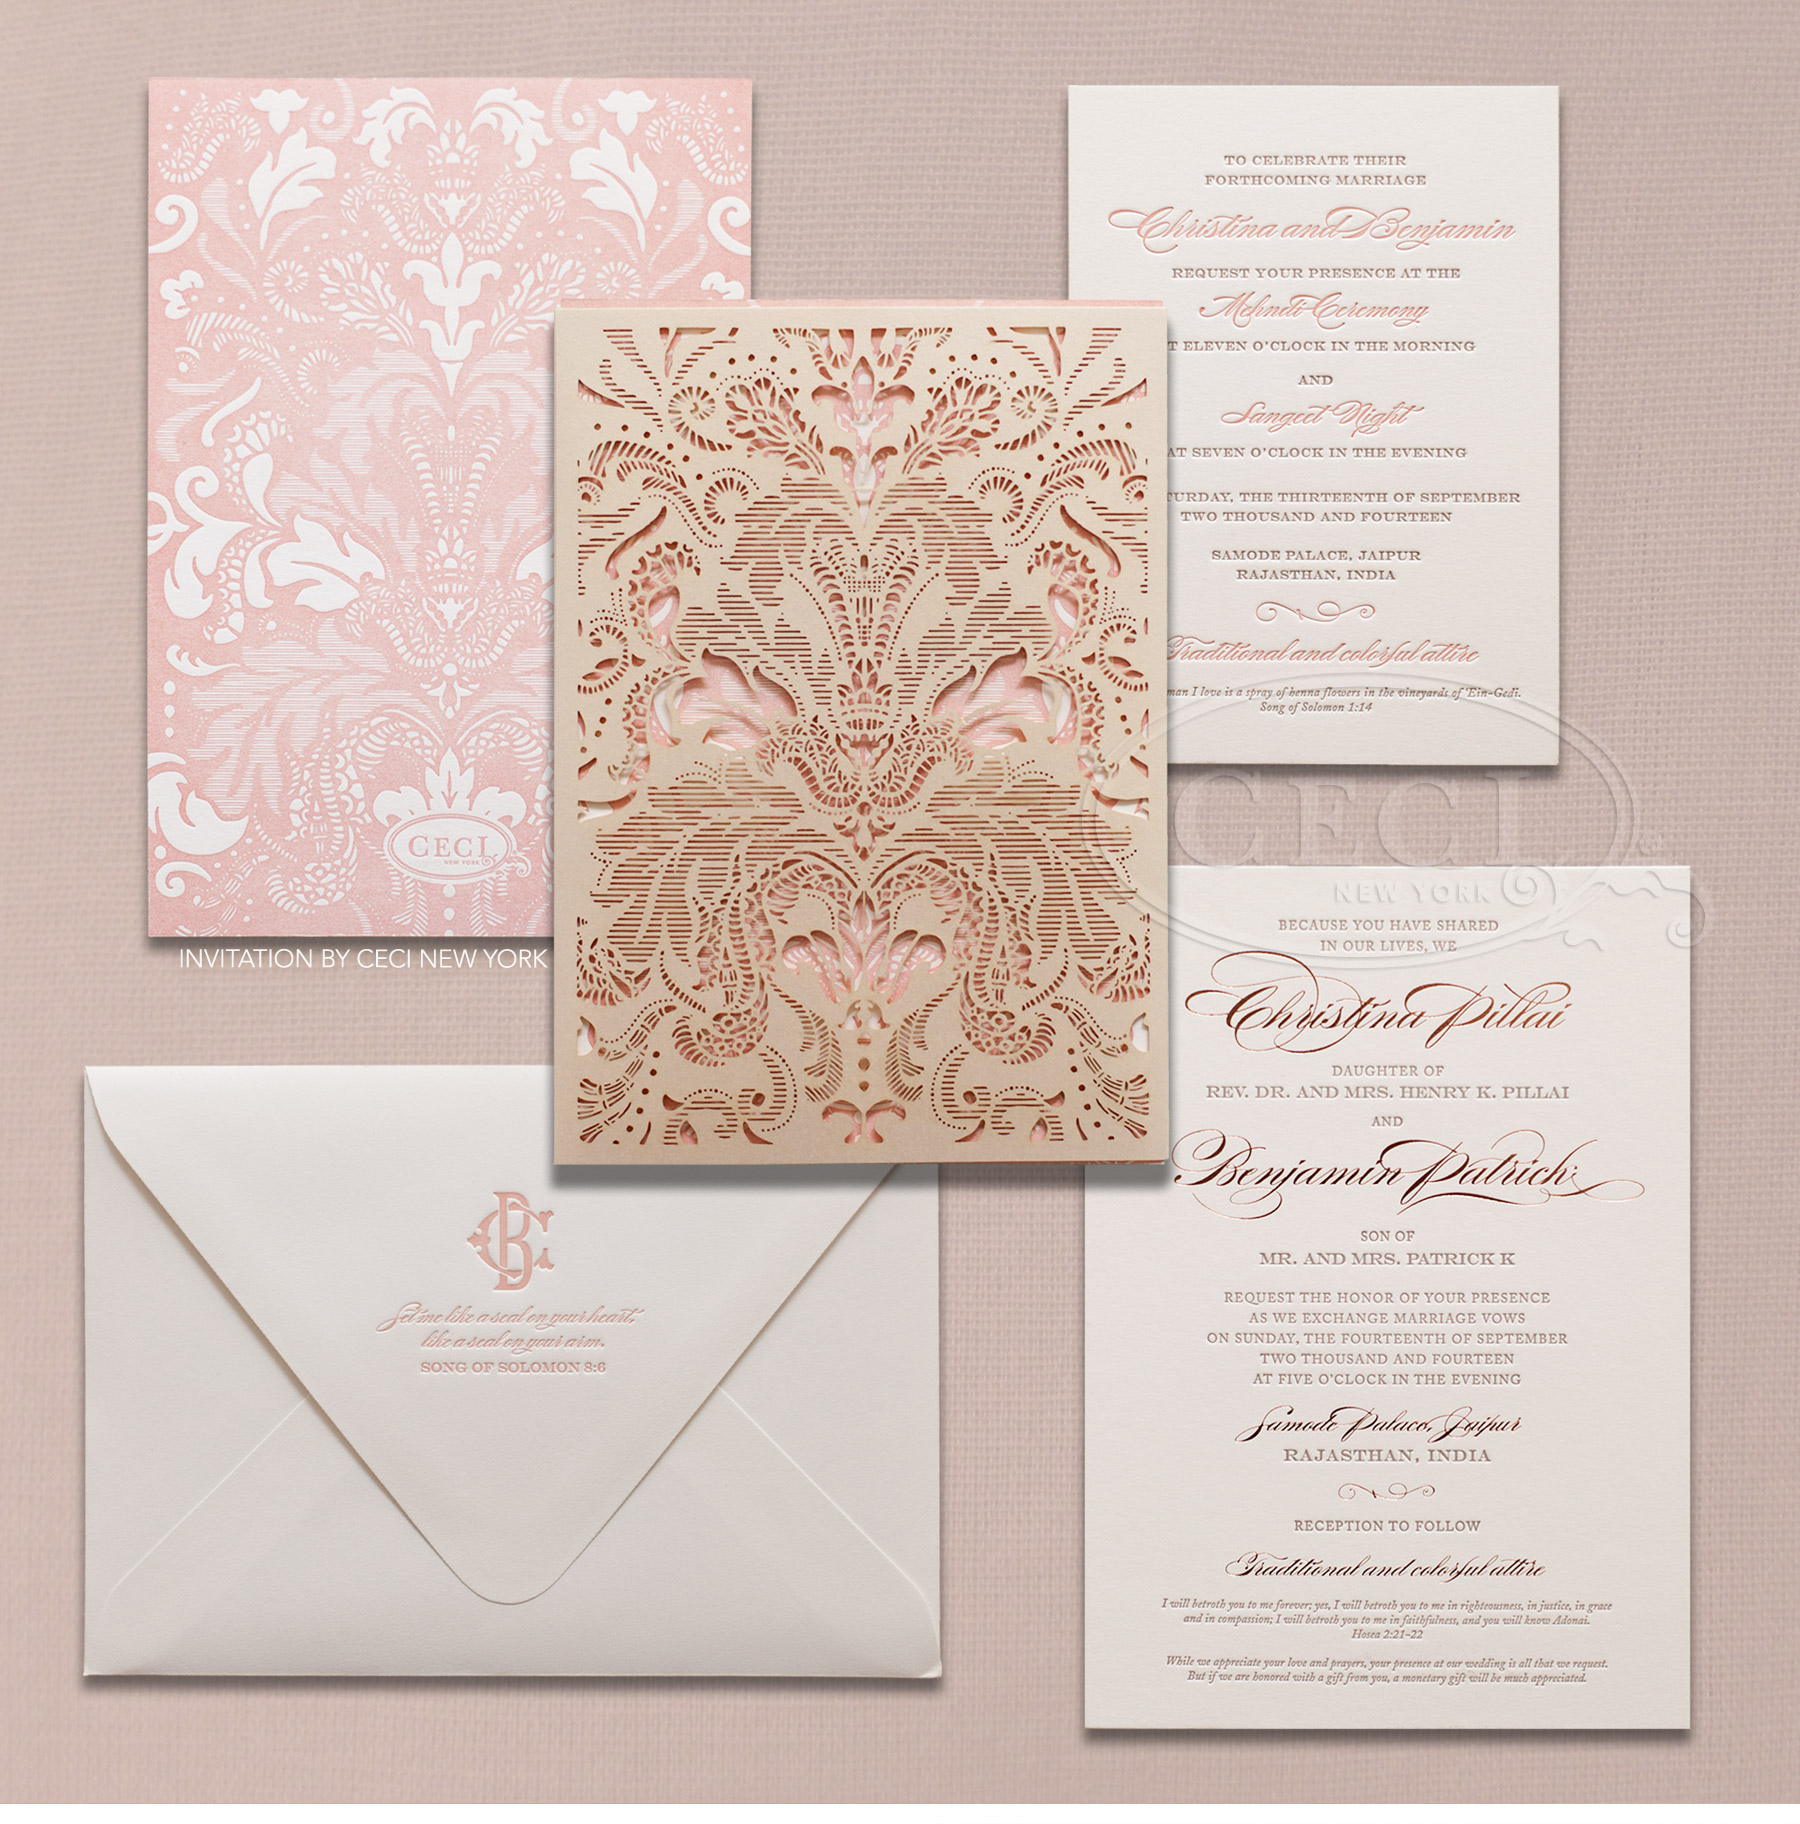 luxury_wedding_samode_palace_jaipur_rajasthan_india_destination_colorful_celebration_traditional_invitations_v246_om_1a.jpg